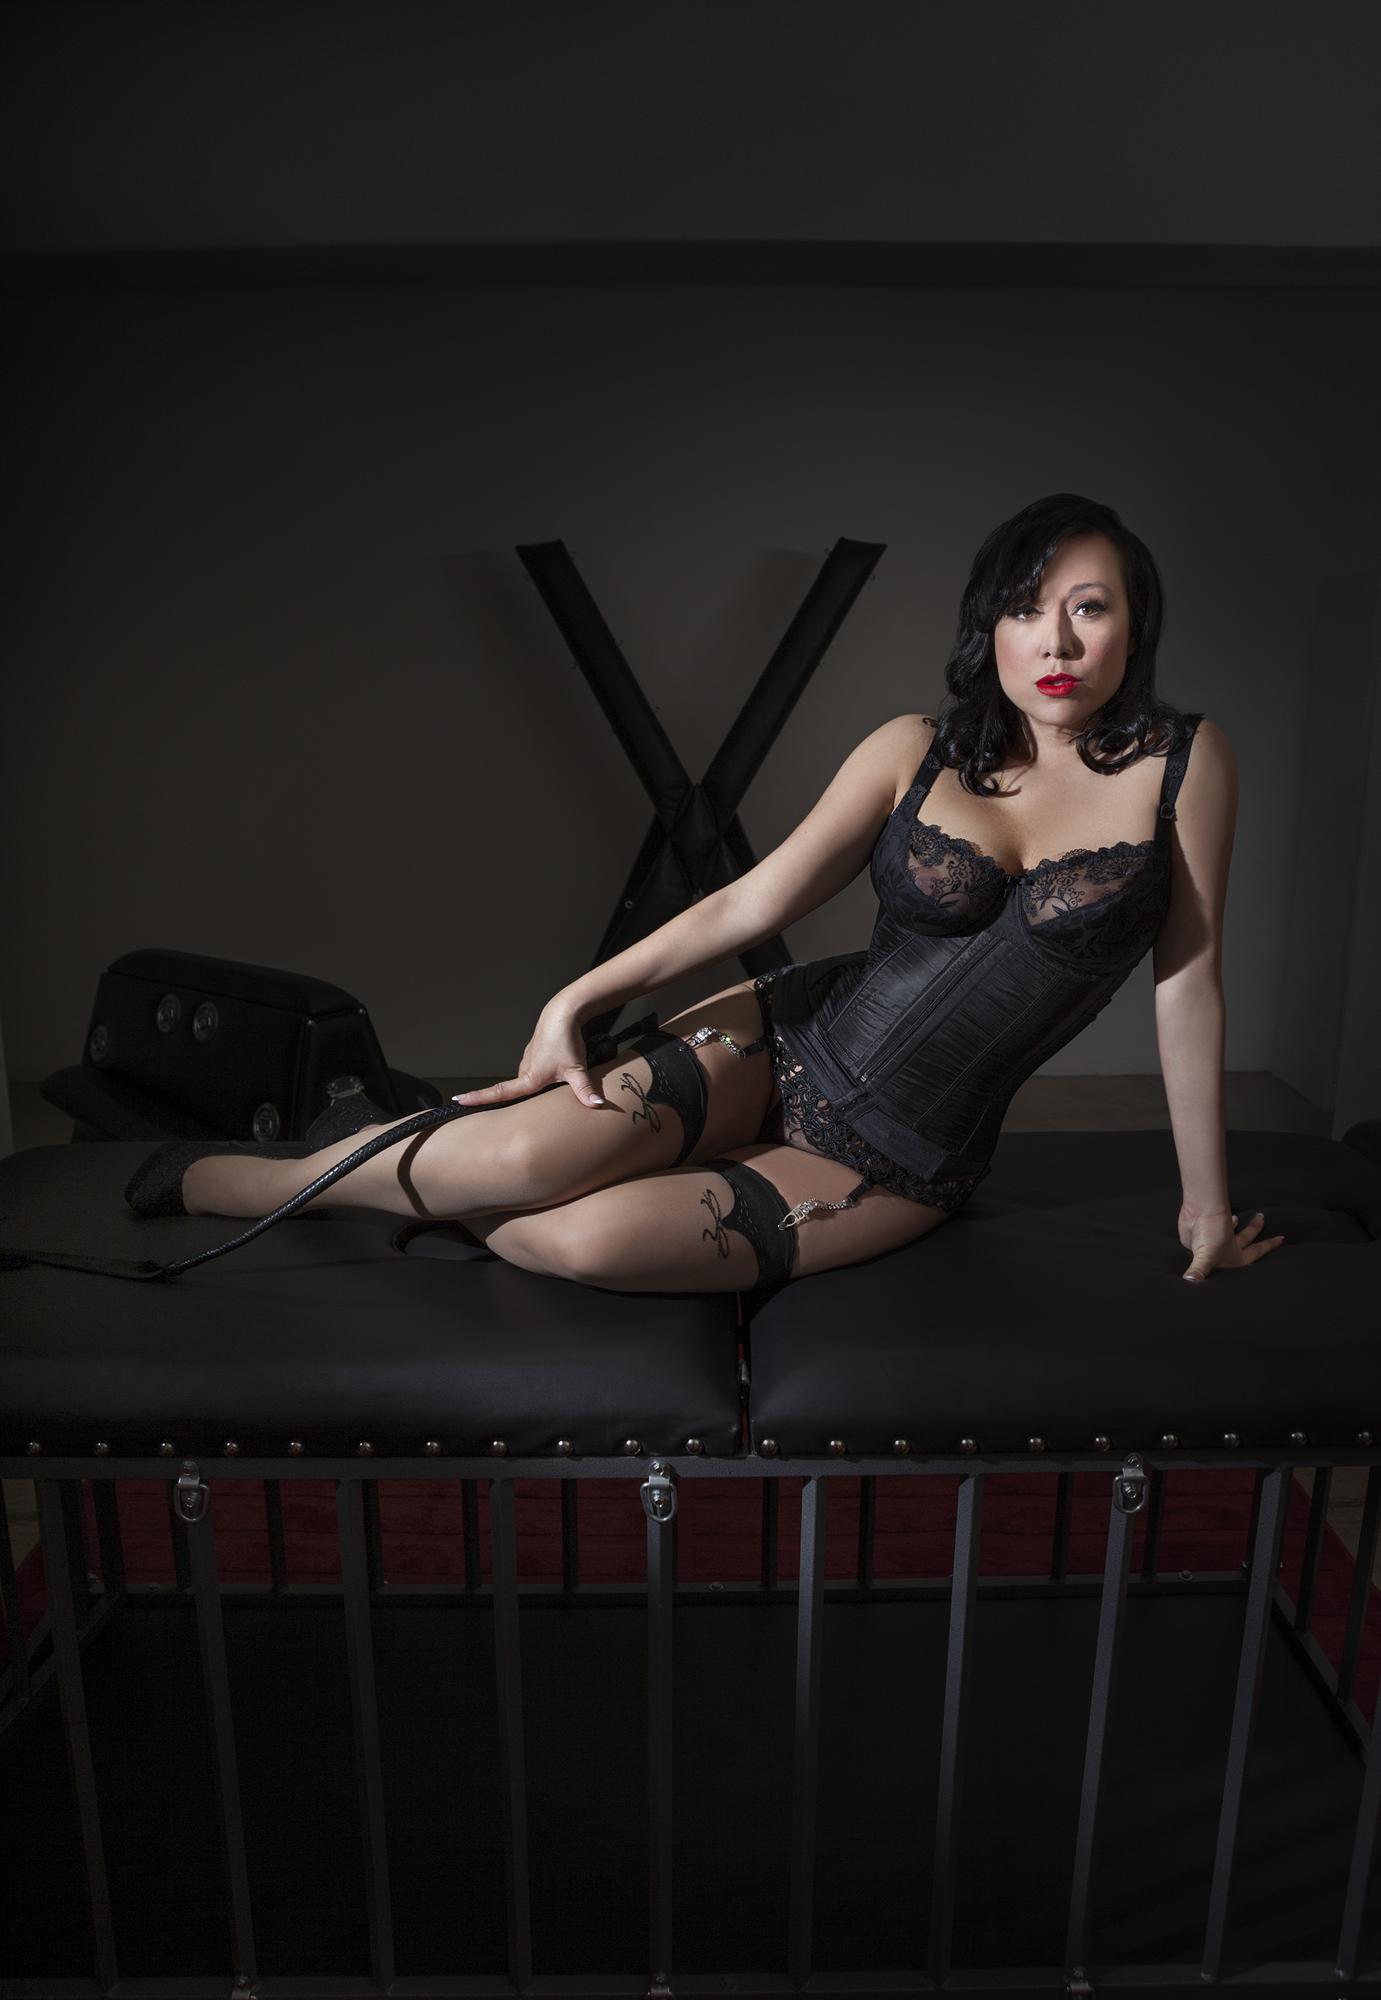 dallas mistress